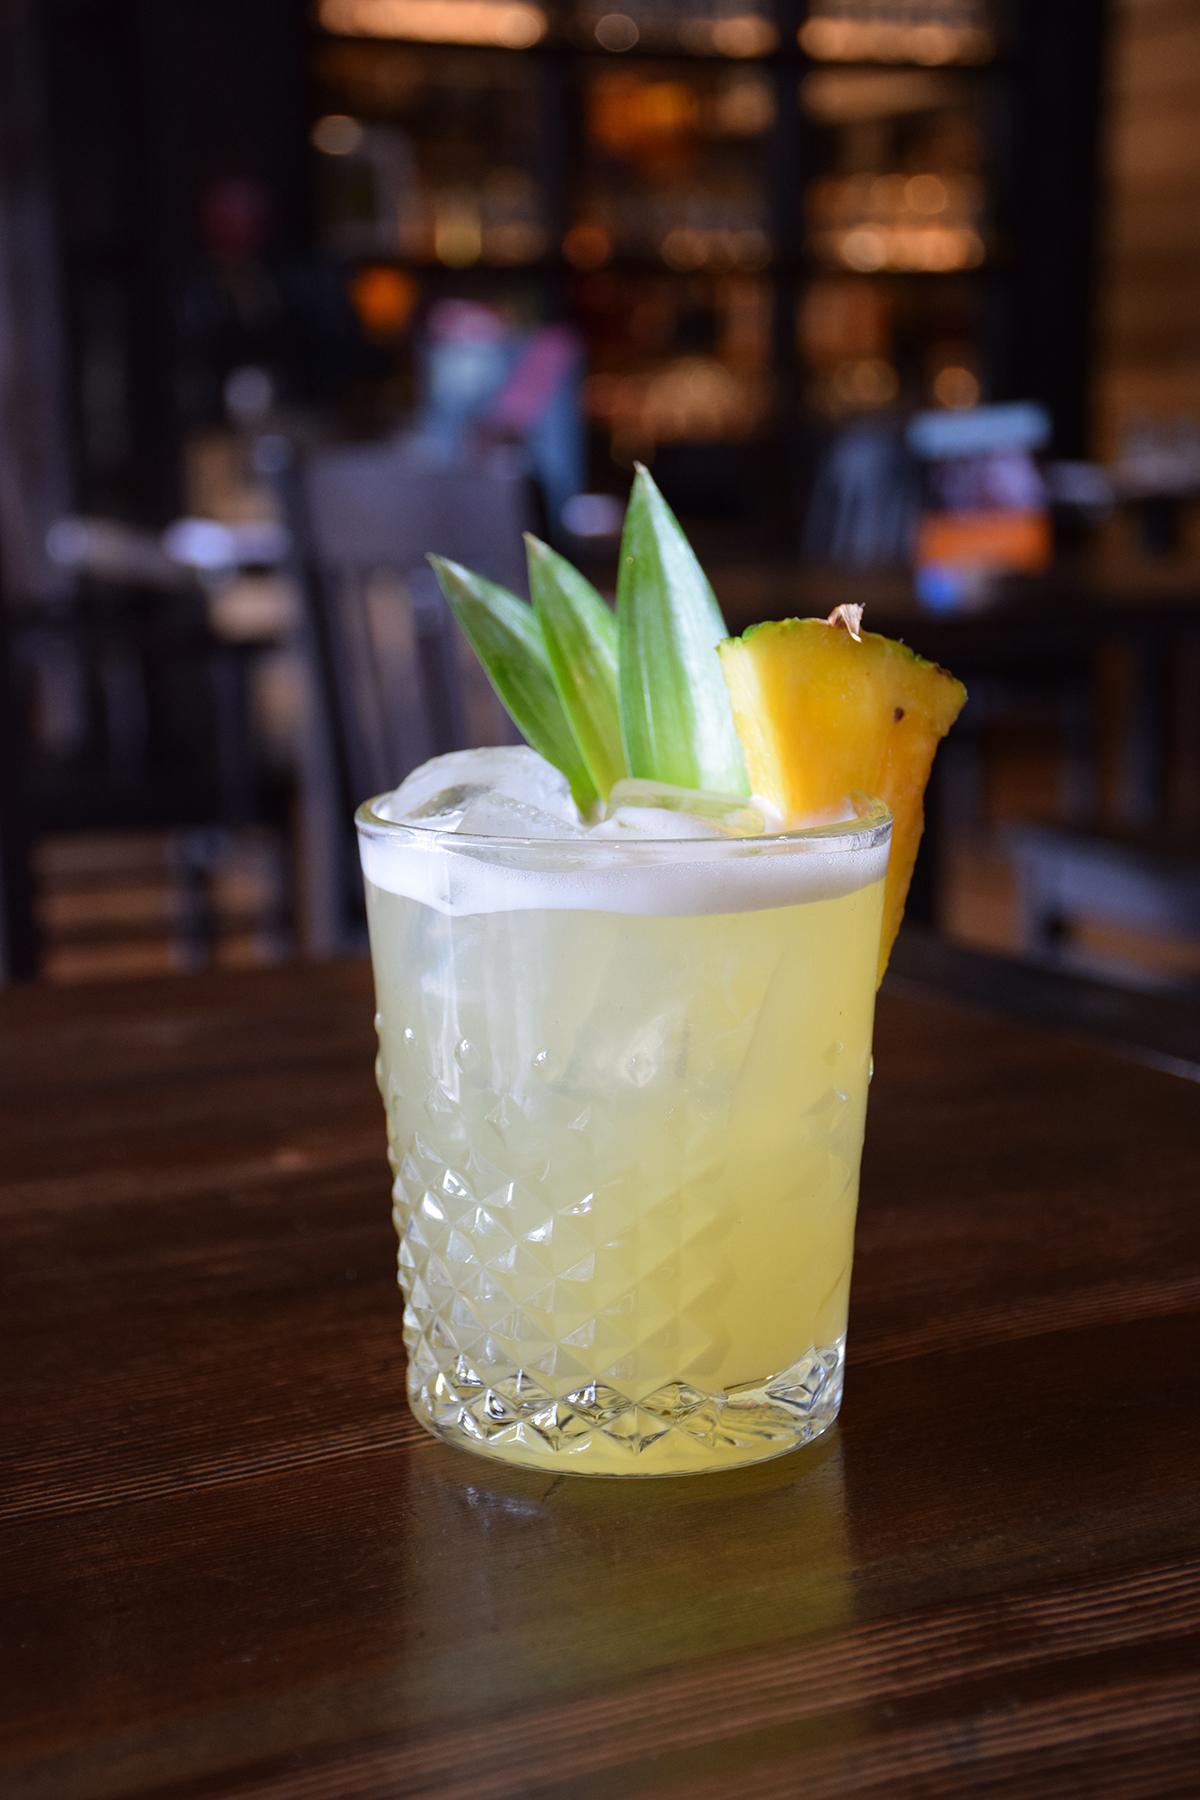 Park Distillery Sawback Cocktail | Photo credit: Park distillery images